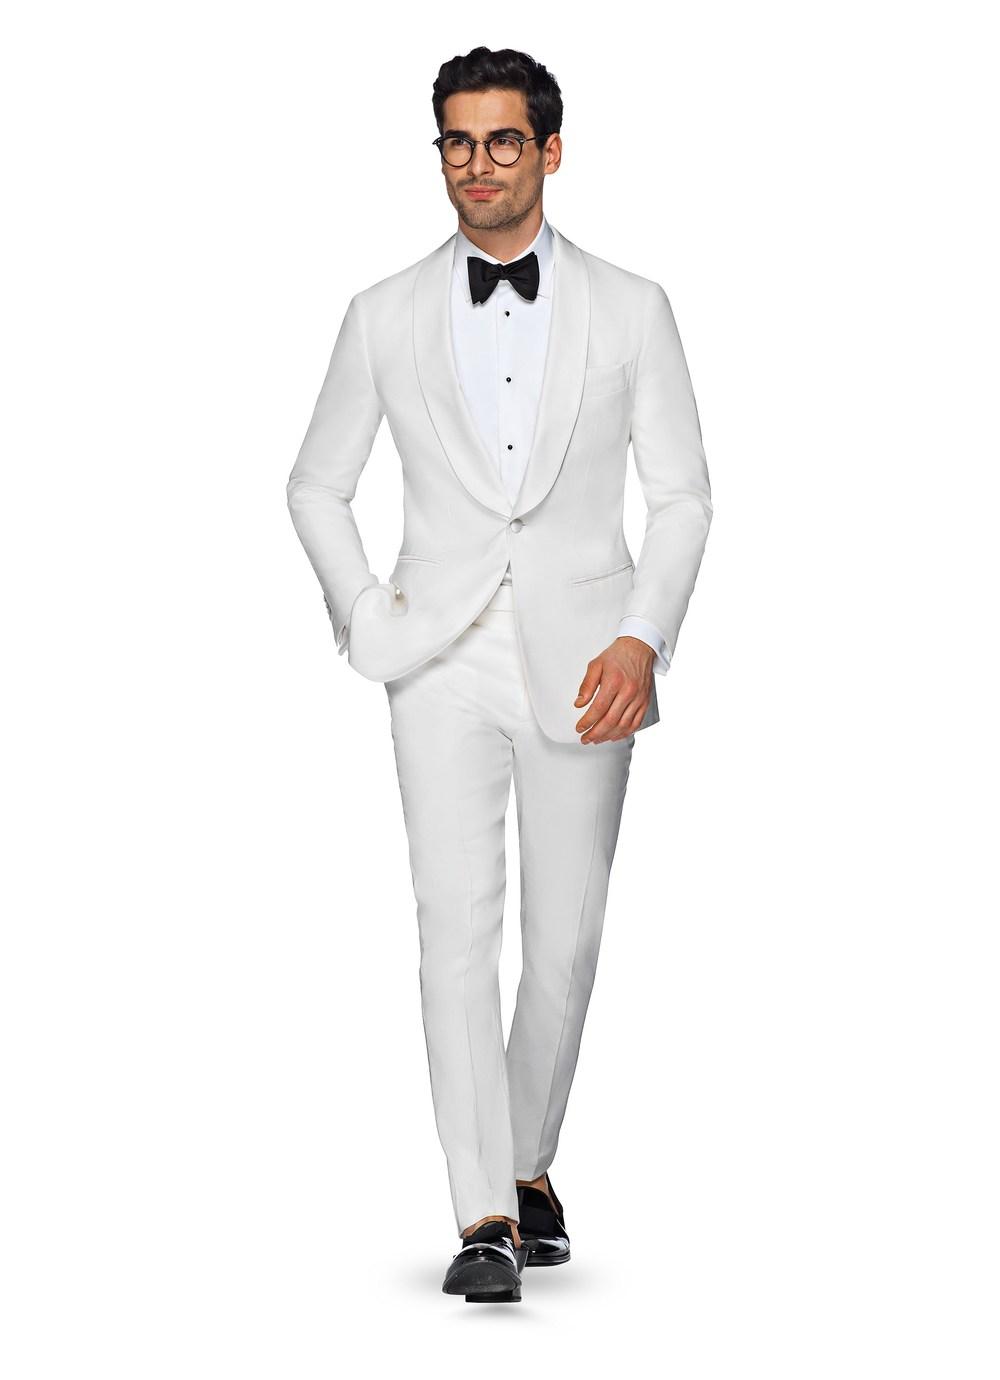 Suit Supply Summer White Tux